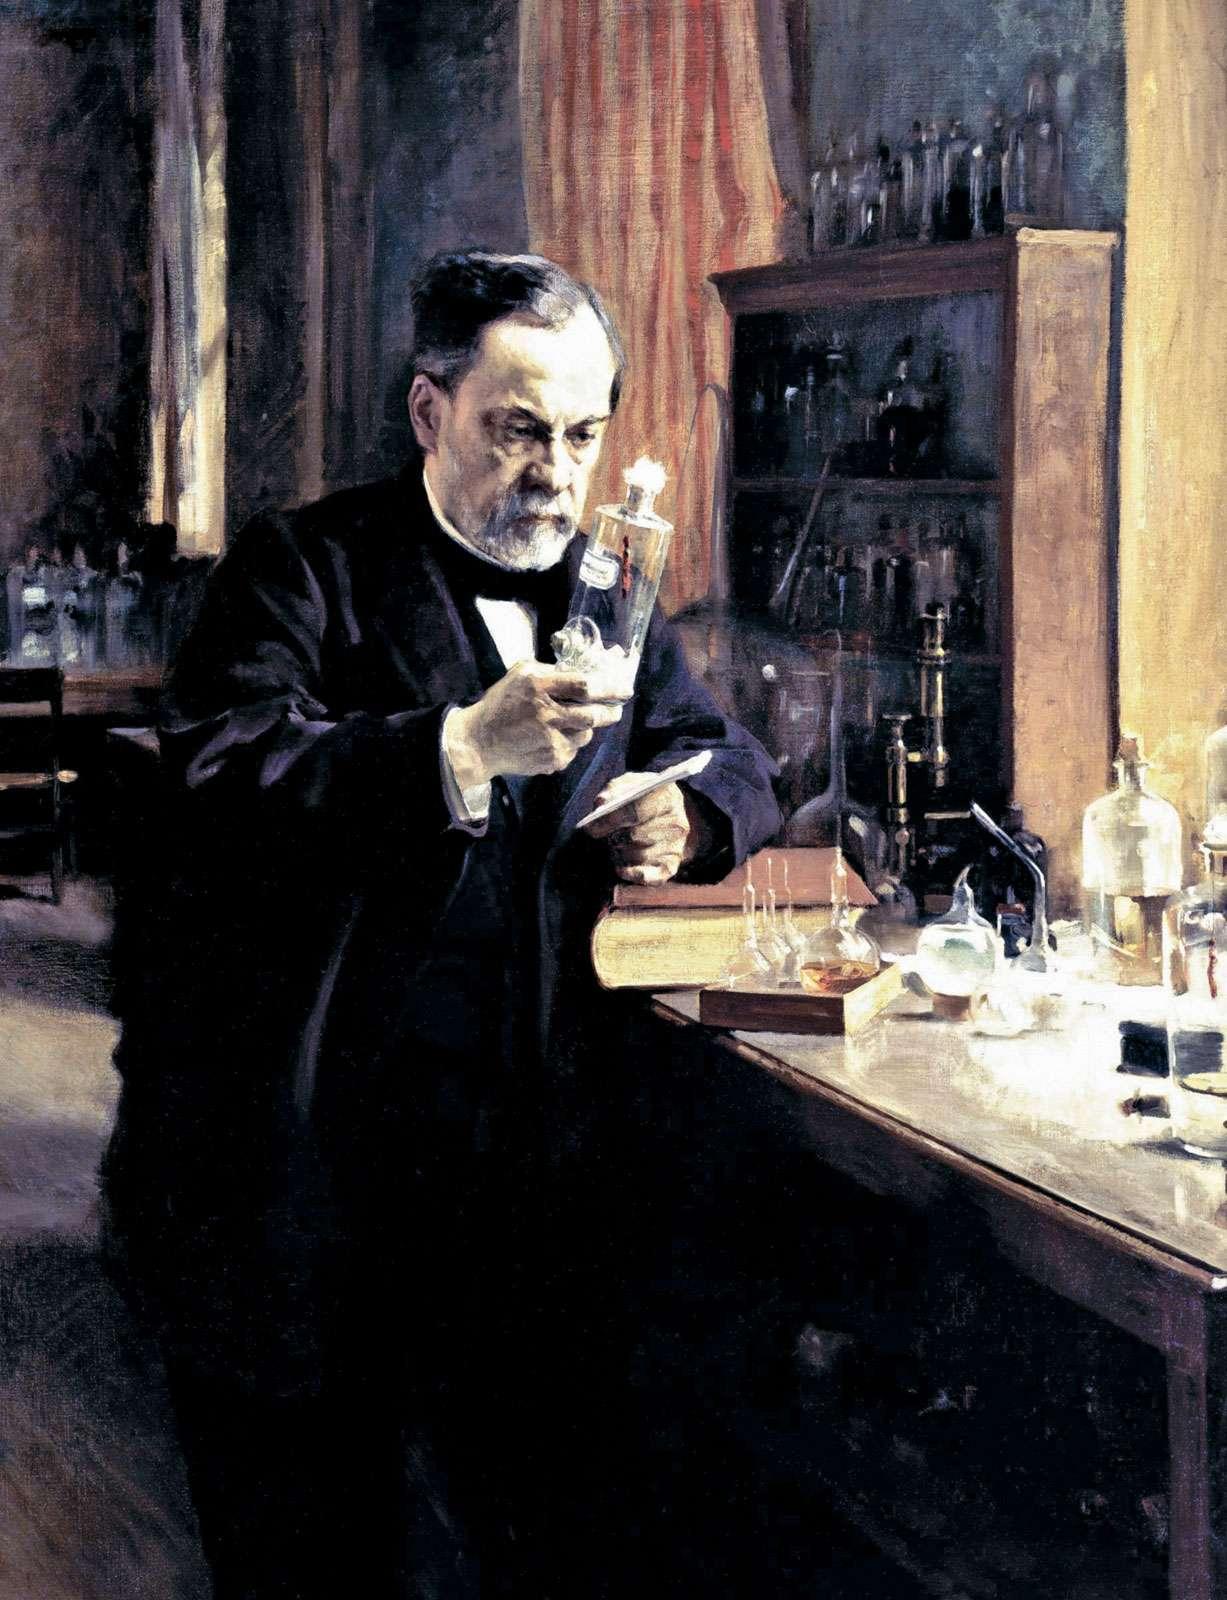 वर्ल्ड जूनोज डे आज- डॉ. लुई पाश्चर ने बनाई थी दुनिया की पहली जूनोटिक वैक्सीन